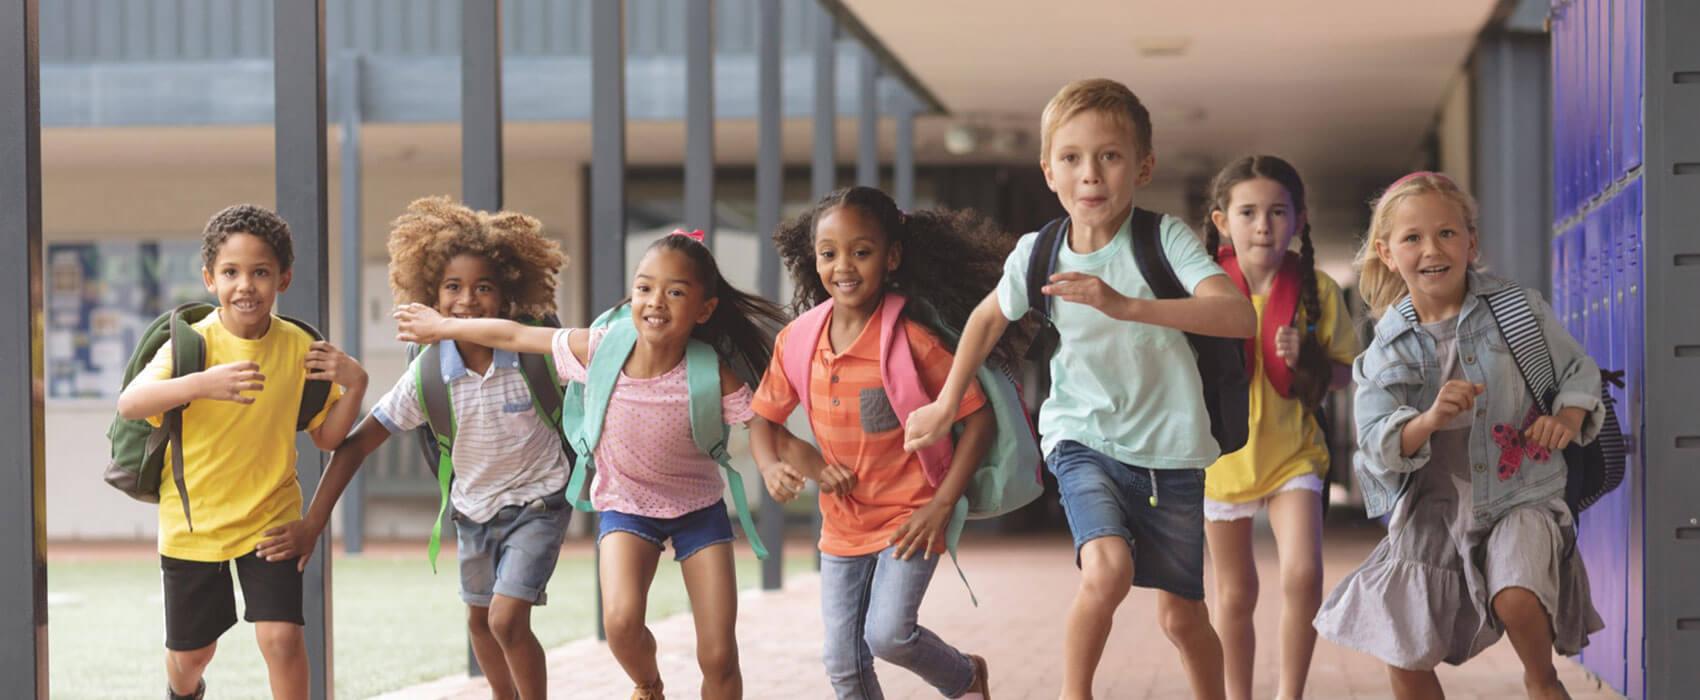 School Help for Autism Children from Juvo Behavioral Health